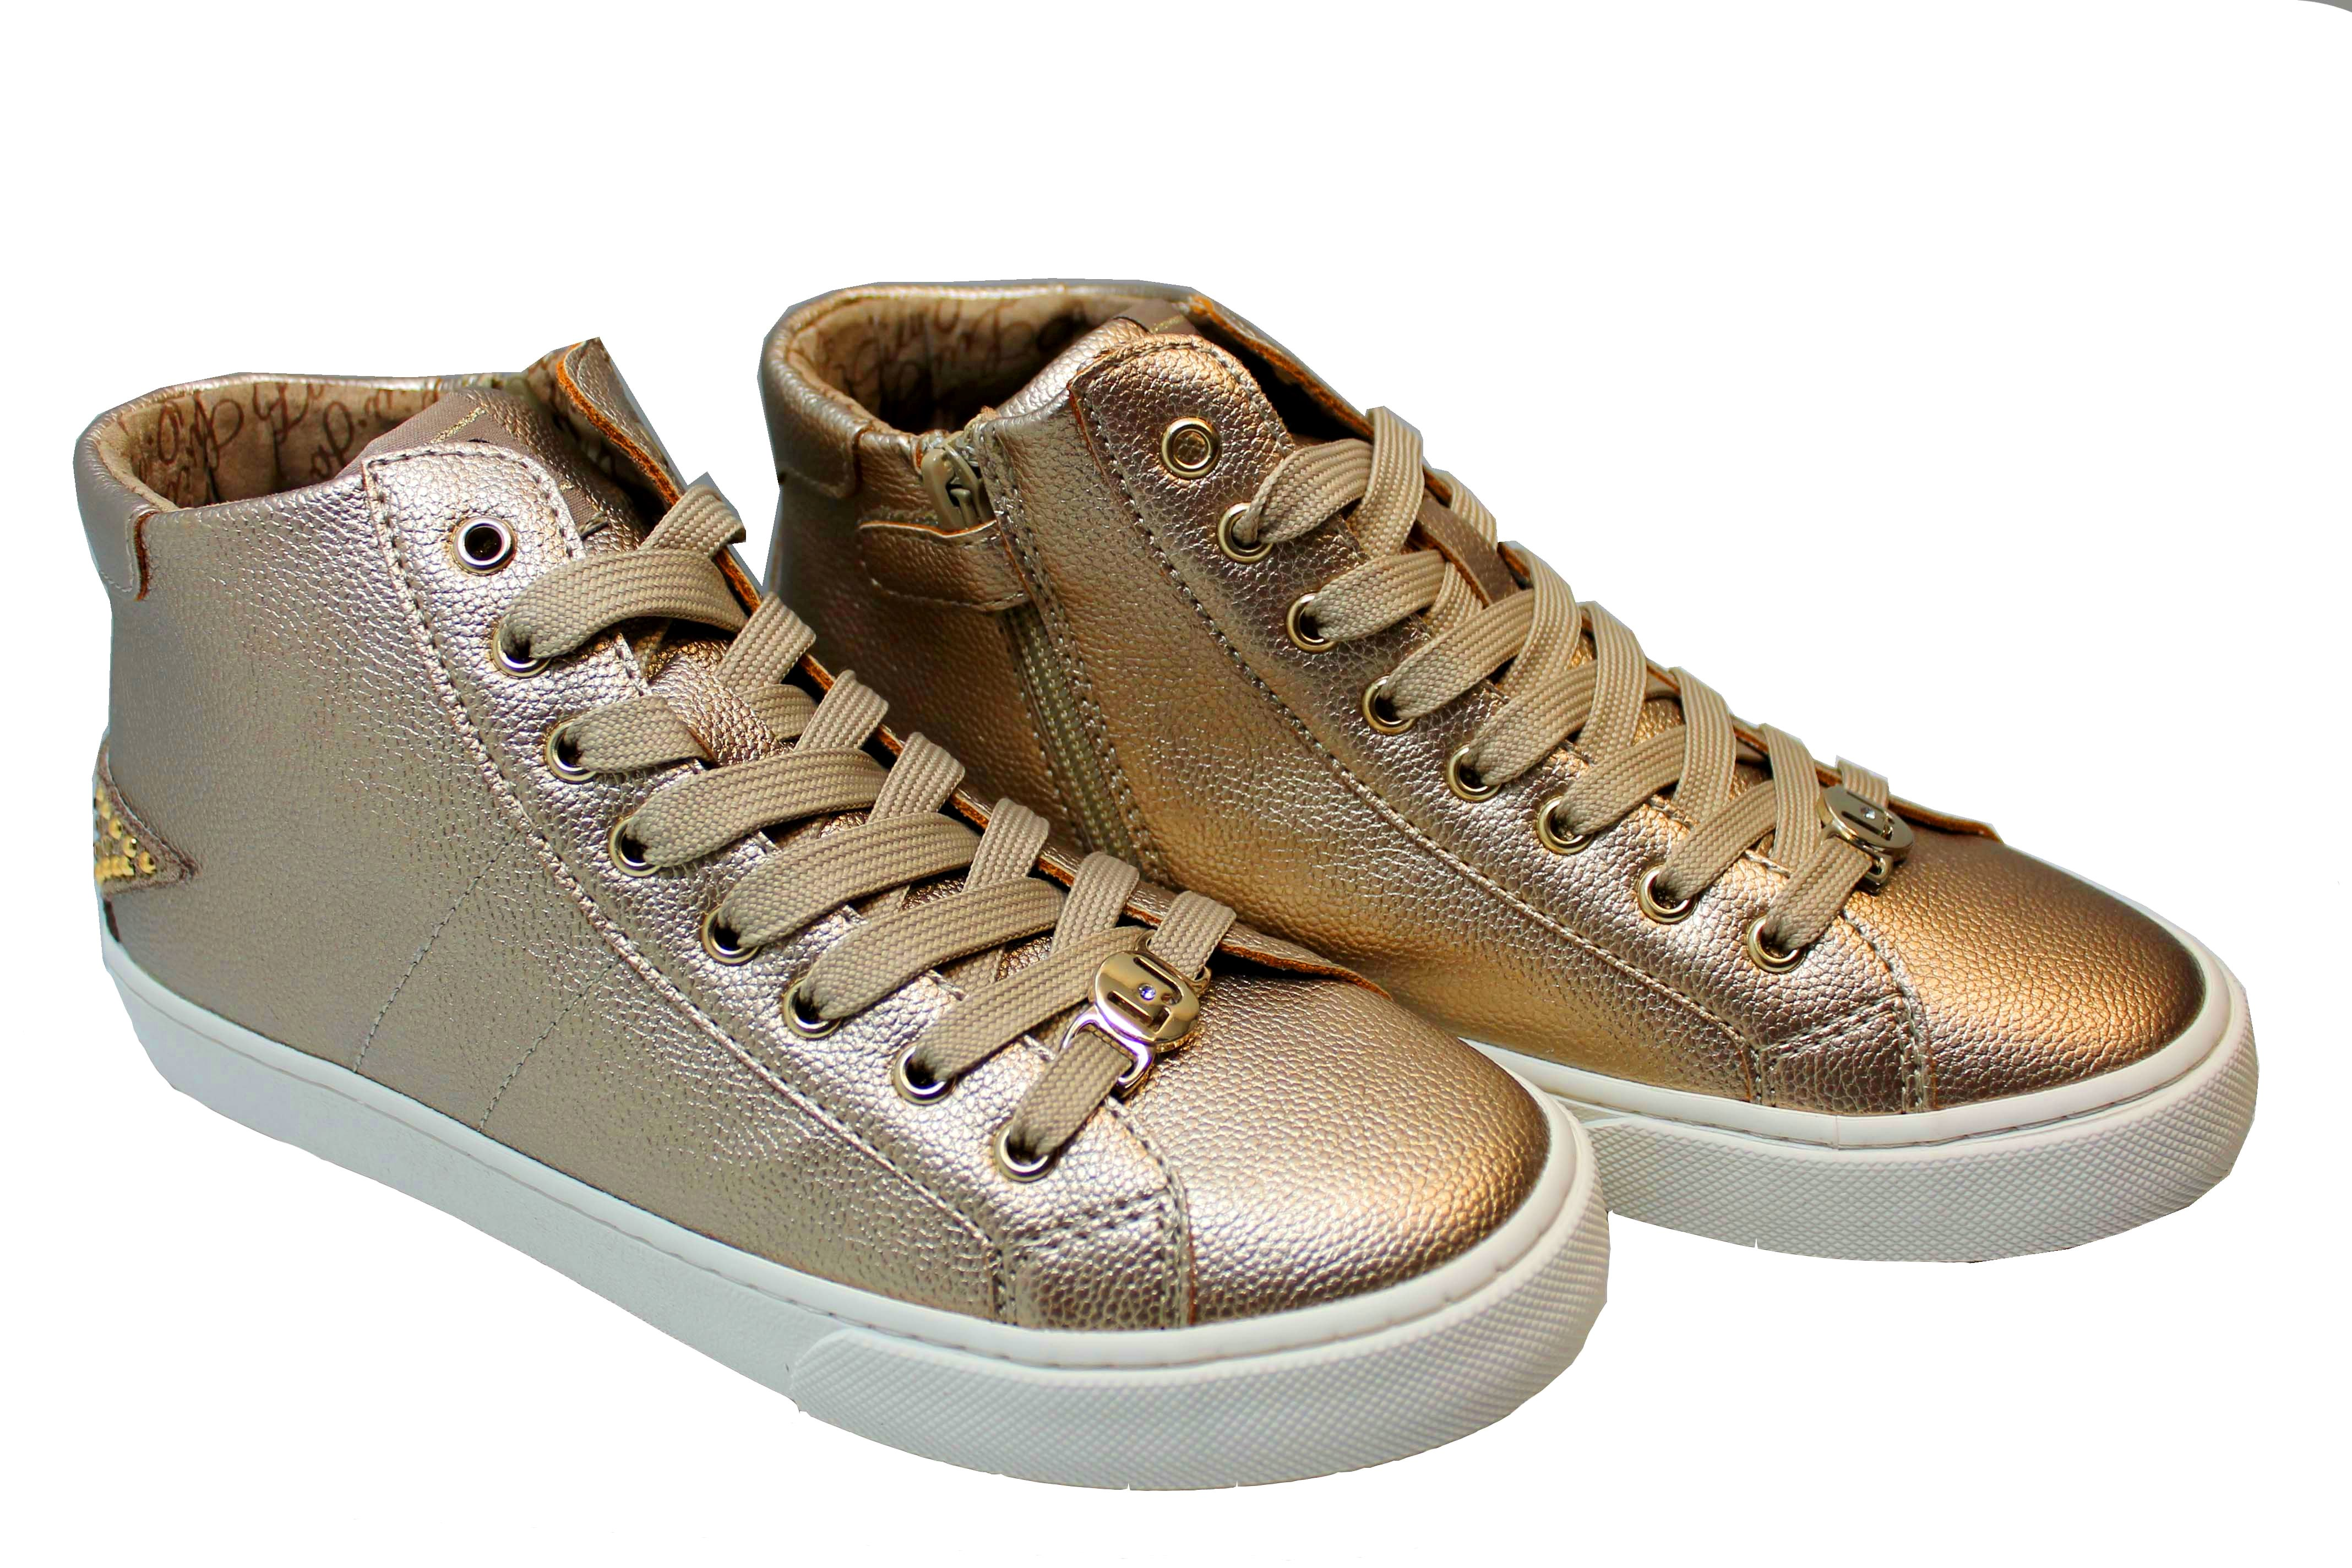 6191dd701b8cb ... Liu Jo Girl UM23259 Oro Sneakers Polacchine Scarpe Bambina Donna  Calzature ...